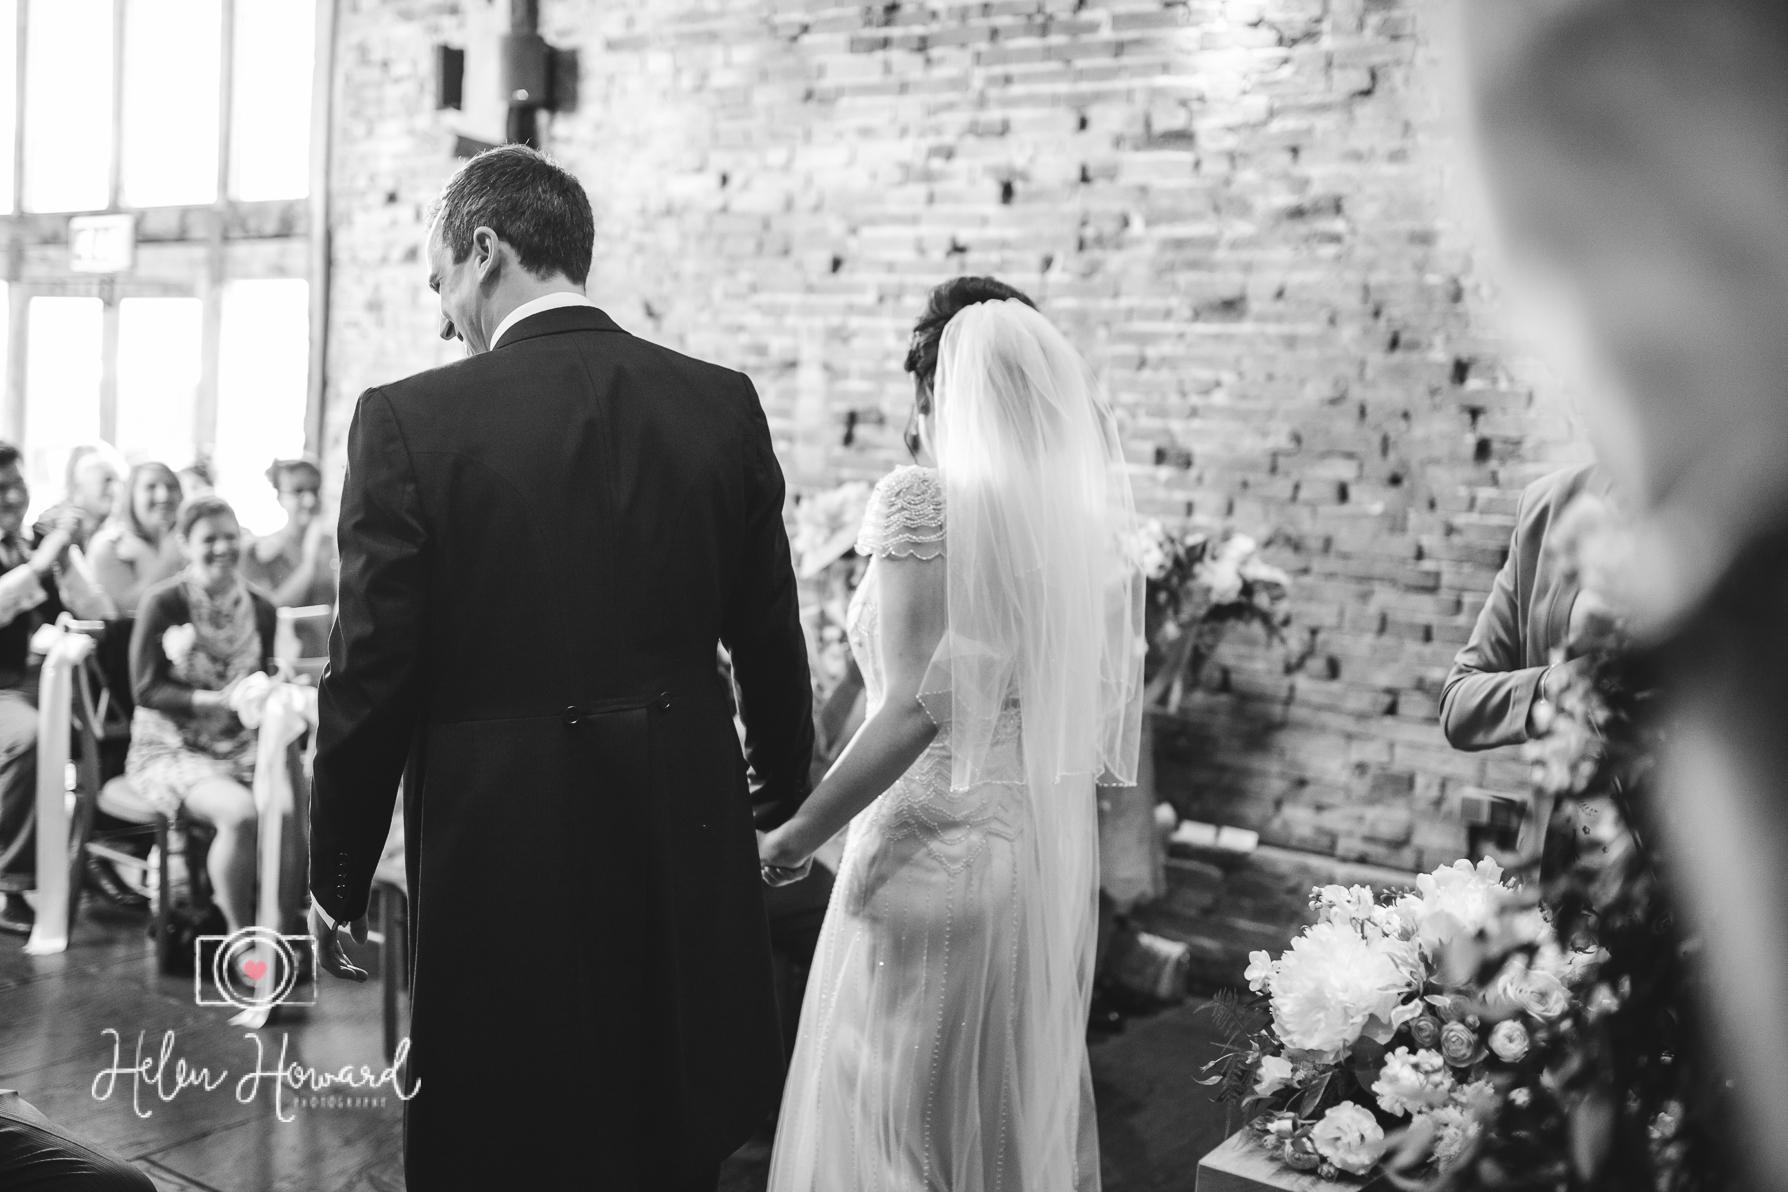 Helen Howard Photography Packington Moor Wedding-63.jpg